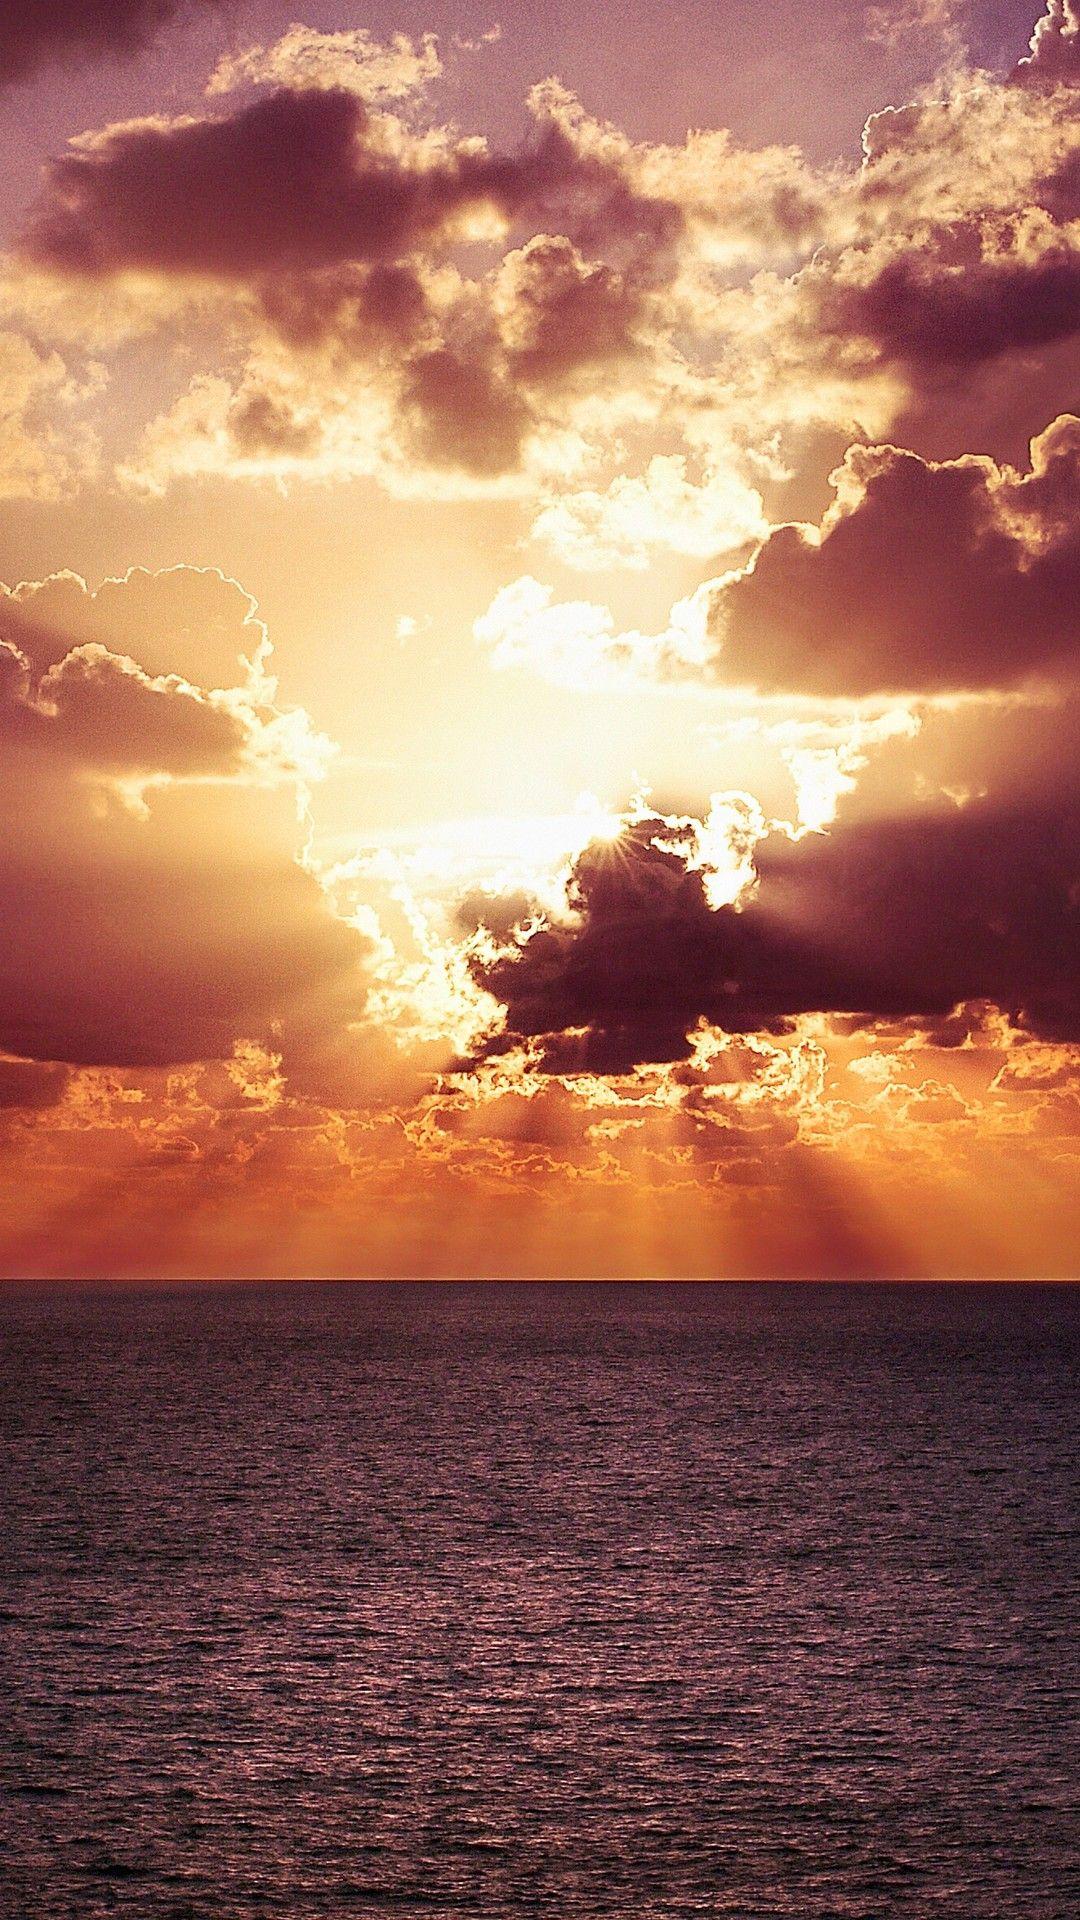 Vibrant Sunset Evening Landscape 4k Mobile Wallpaper